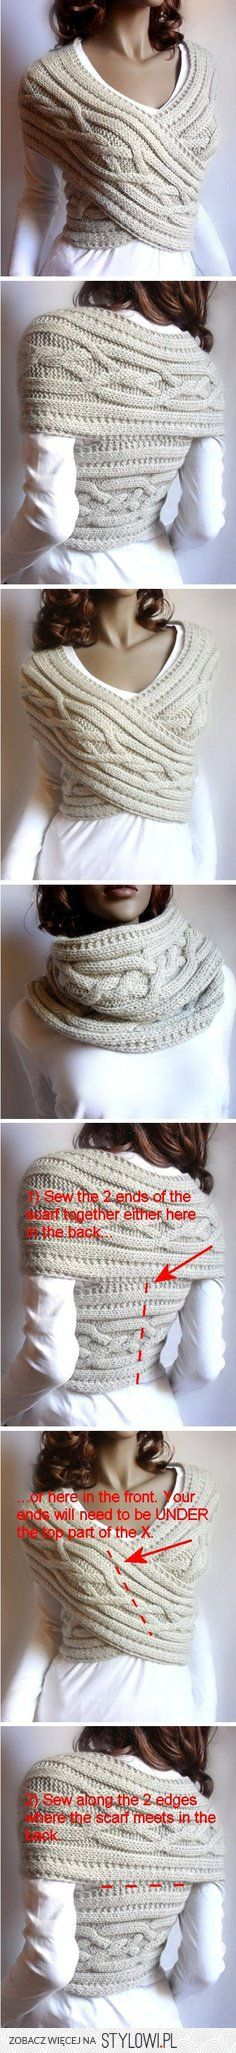 Infinity scarf / sweater vest